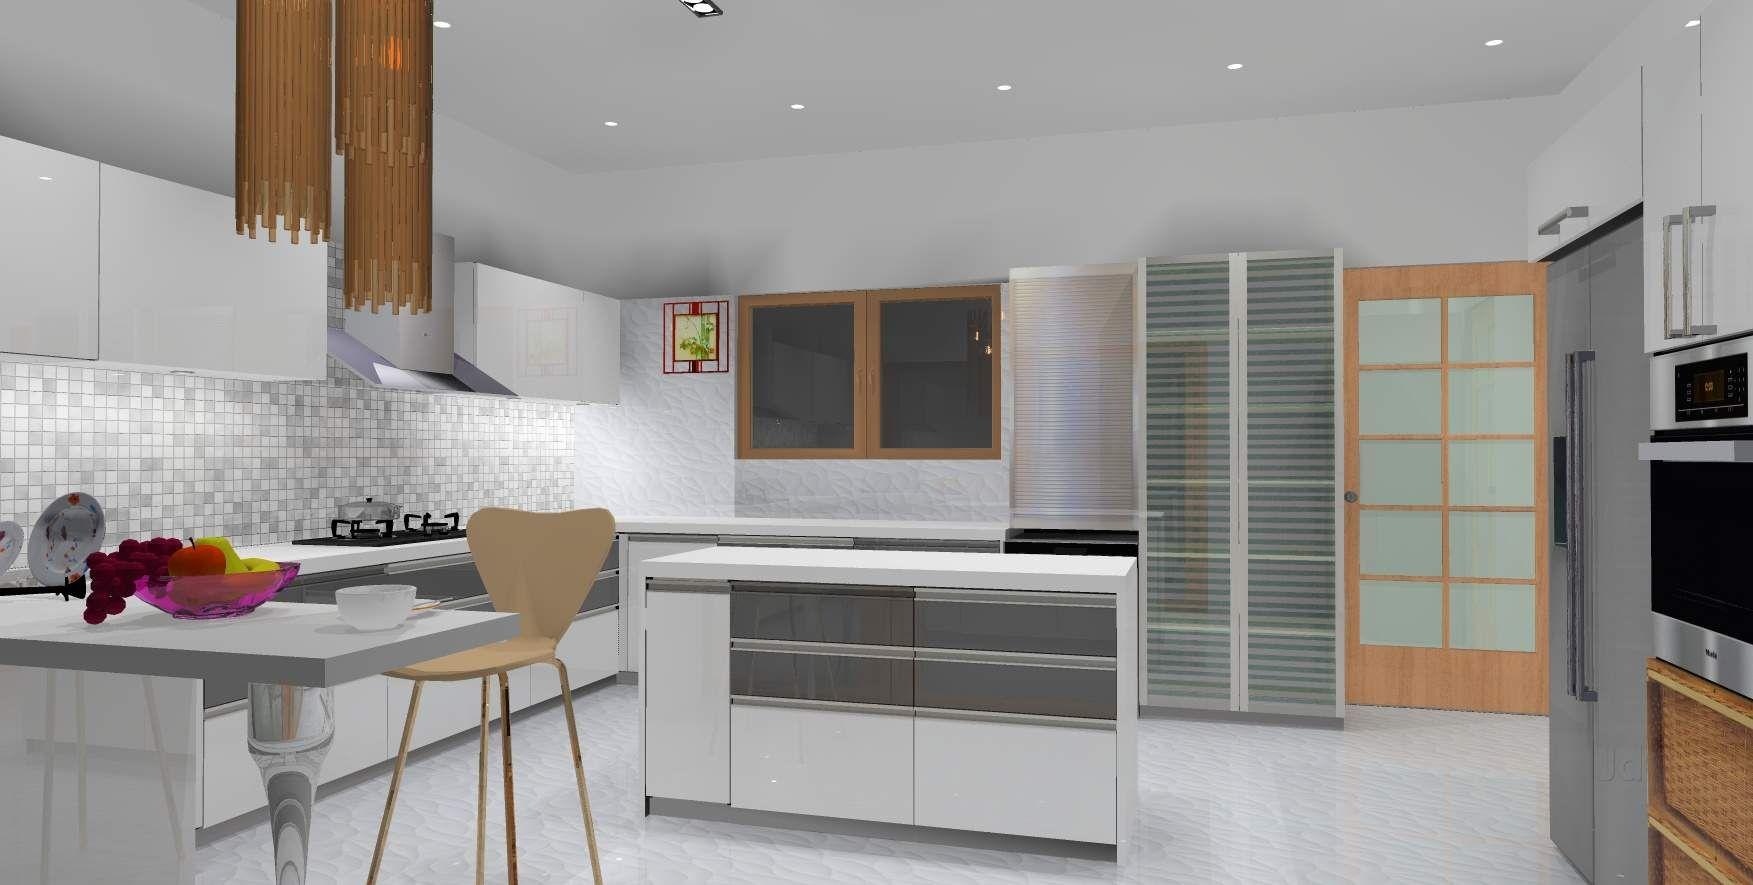 Kitchen Ideas Nagpur Home Home Decor House Plans